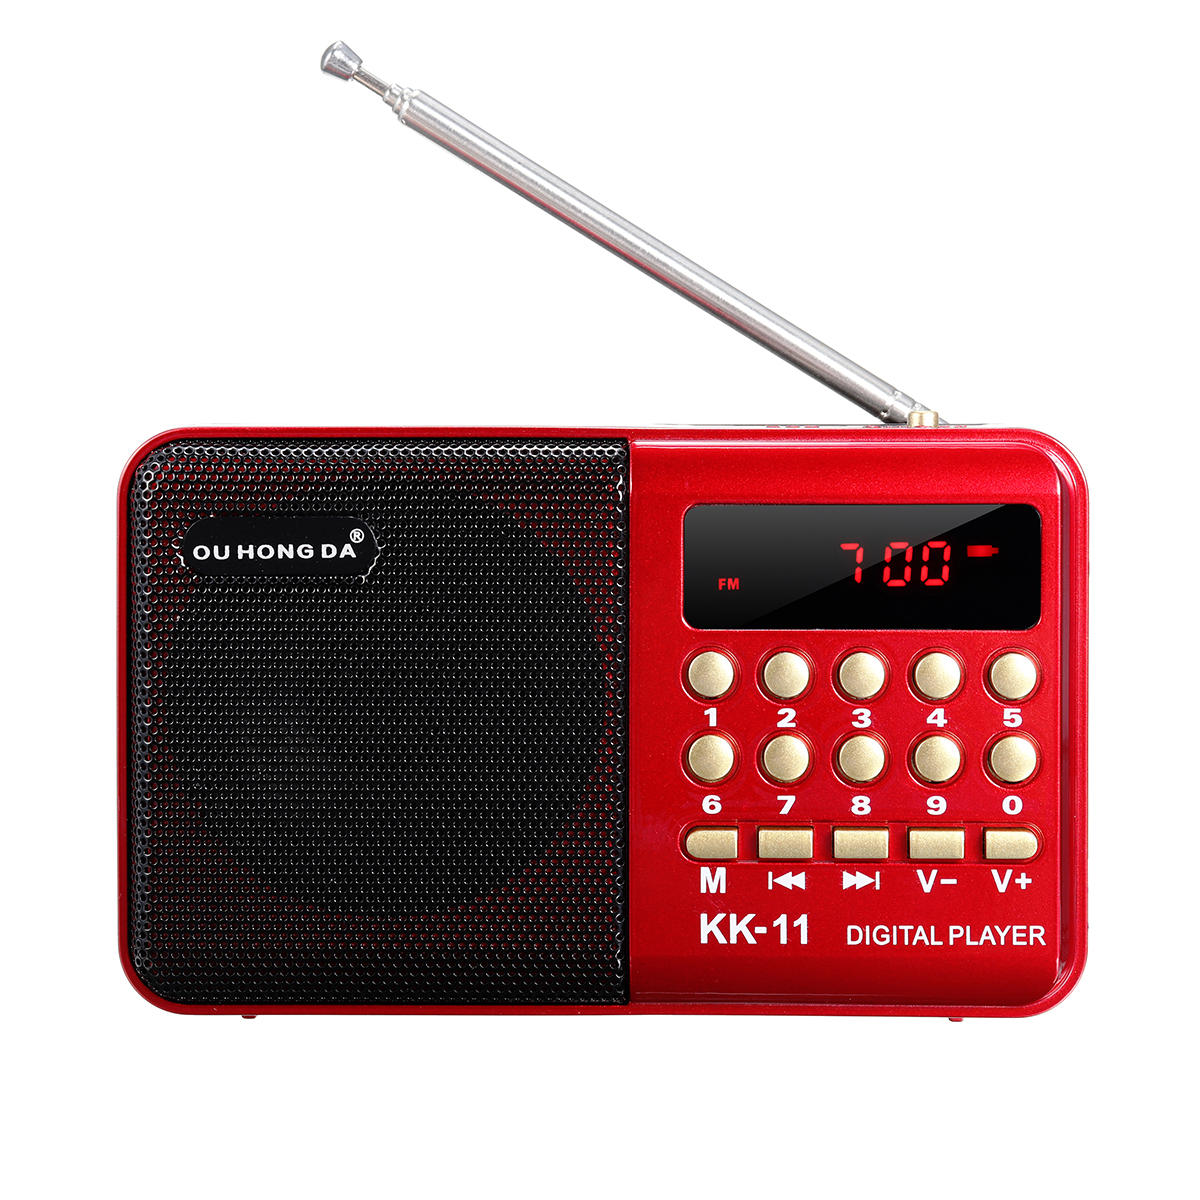 DC 5V 3W Mini Portable Pocket LCD Digital FM Radio Speaker USB TF AUX MP3 Player